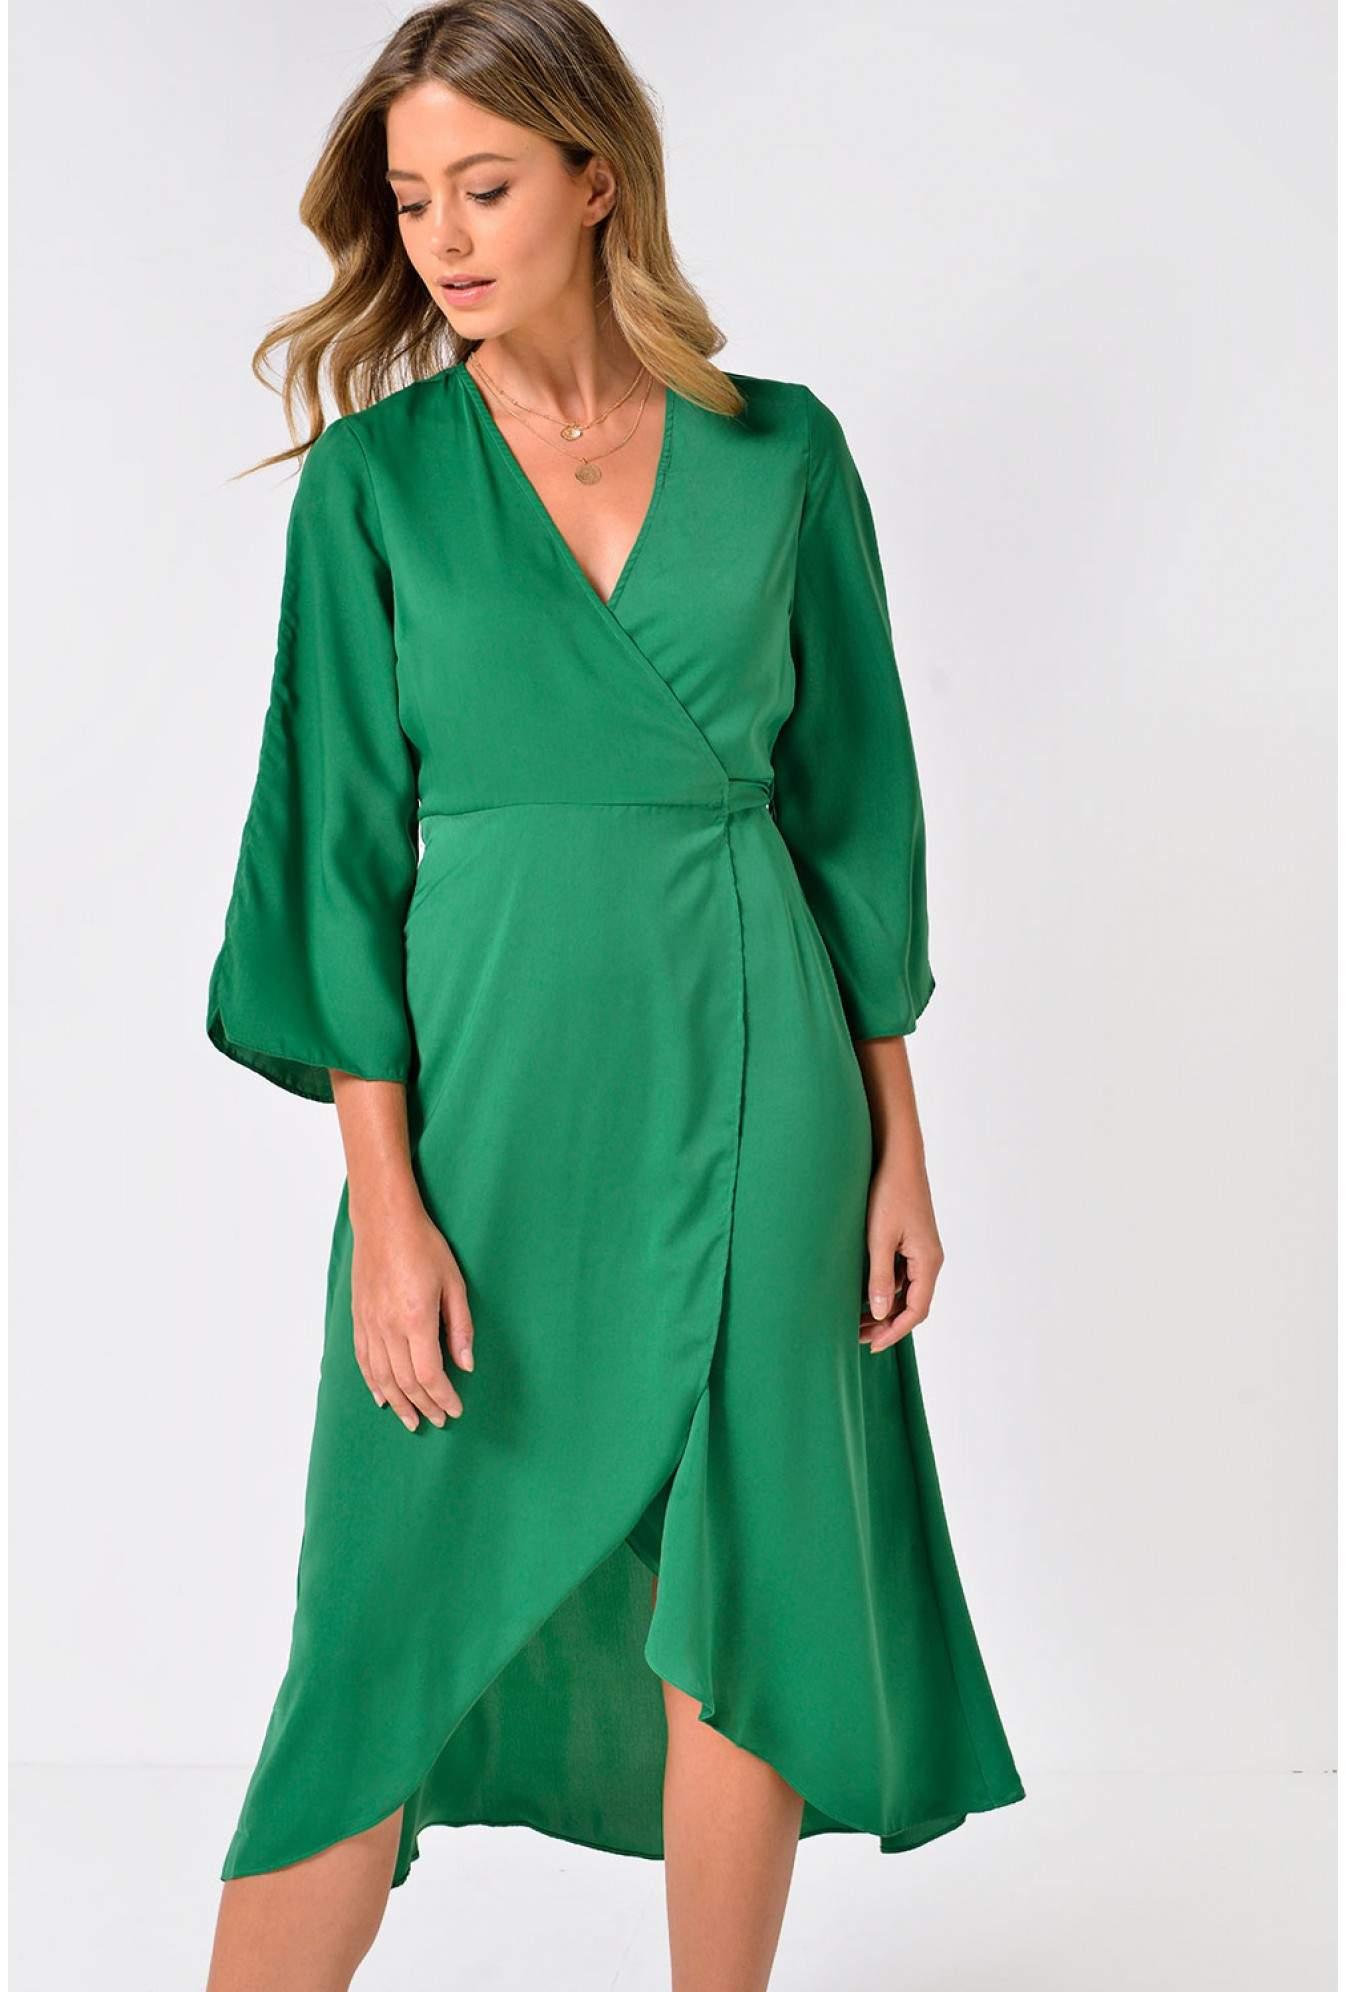 19cbfe409ea6 Vero Moda Scarlet Bell Sleeve Midi Wrap Dress in Green